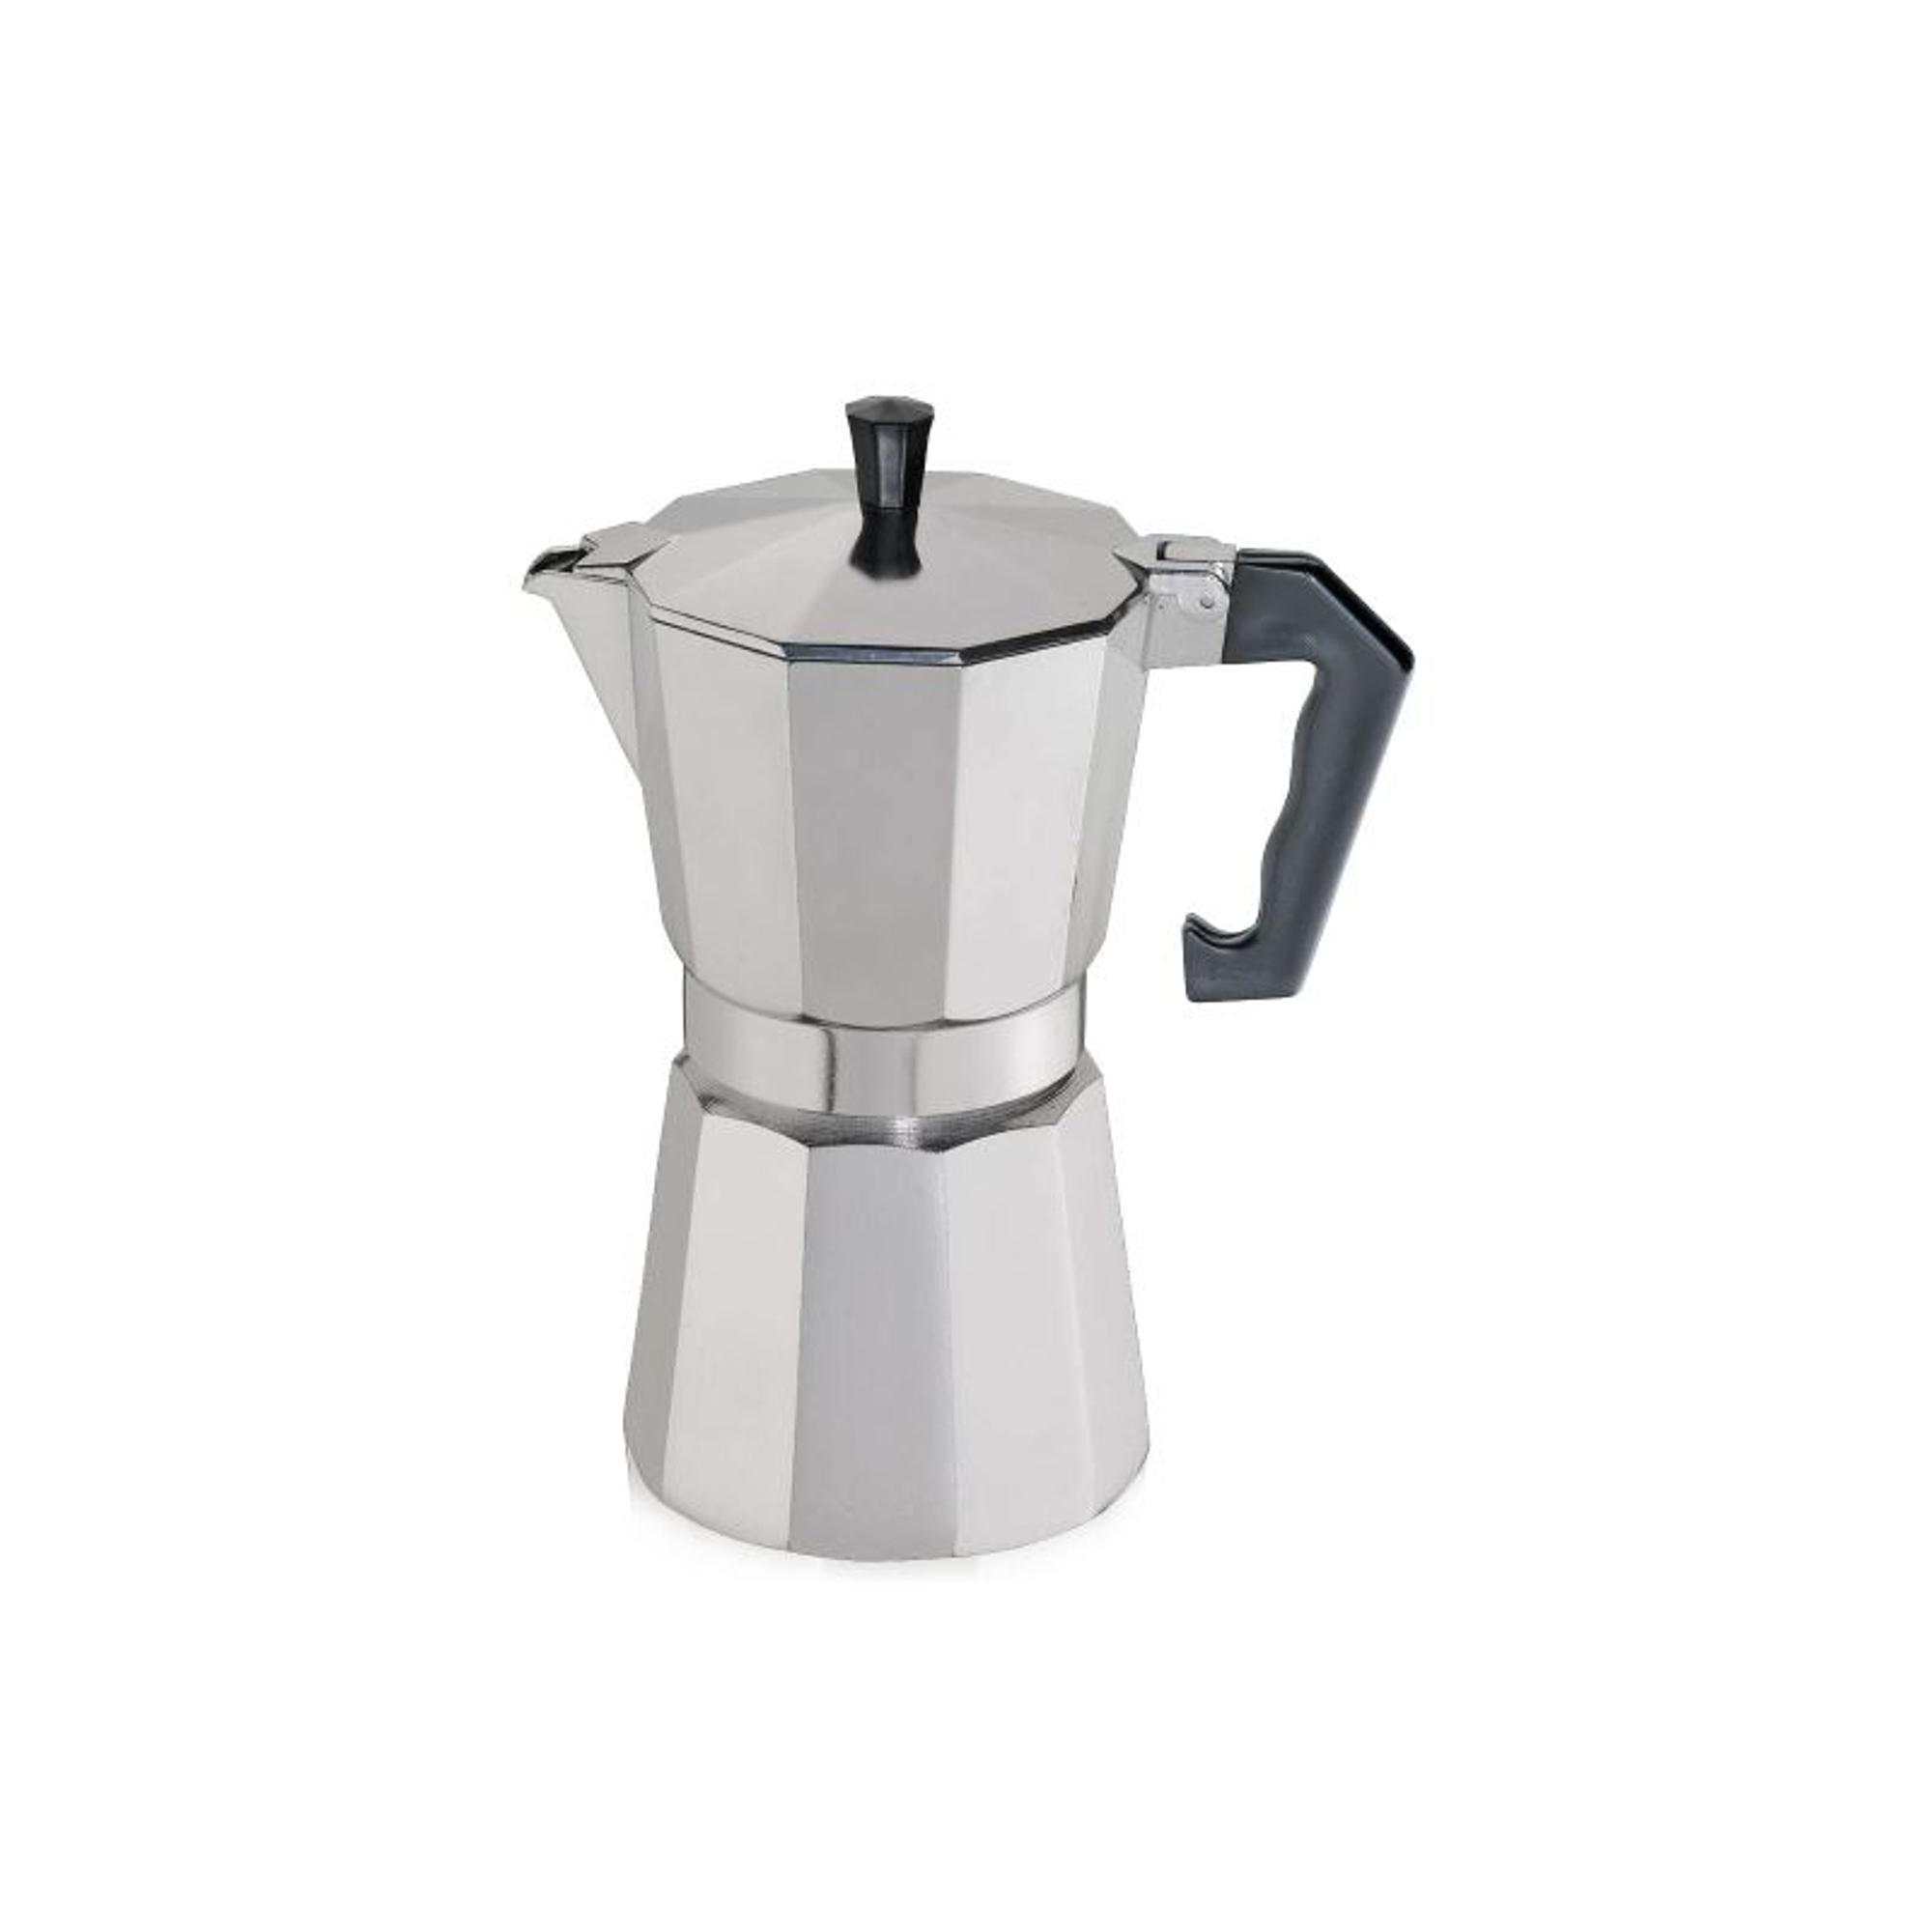 Cilio Classico Induction Espresso Maker with Cilio Roma Dark Blue Porcelain Espresso Cup & Saucer